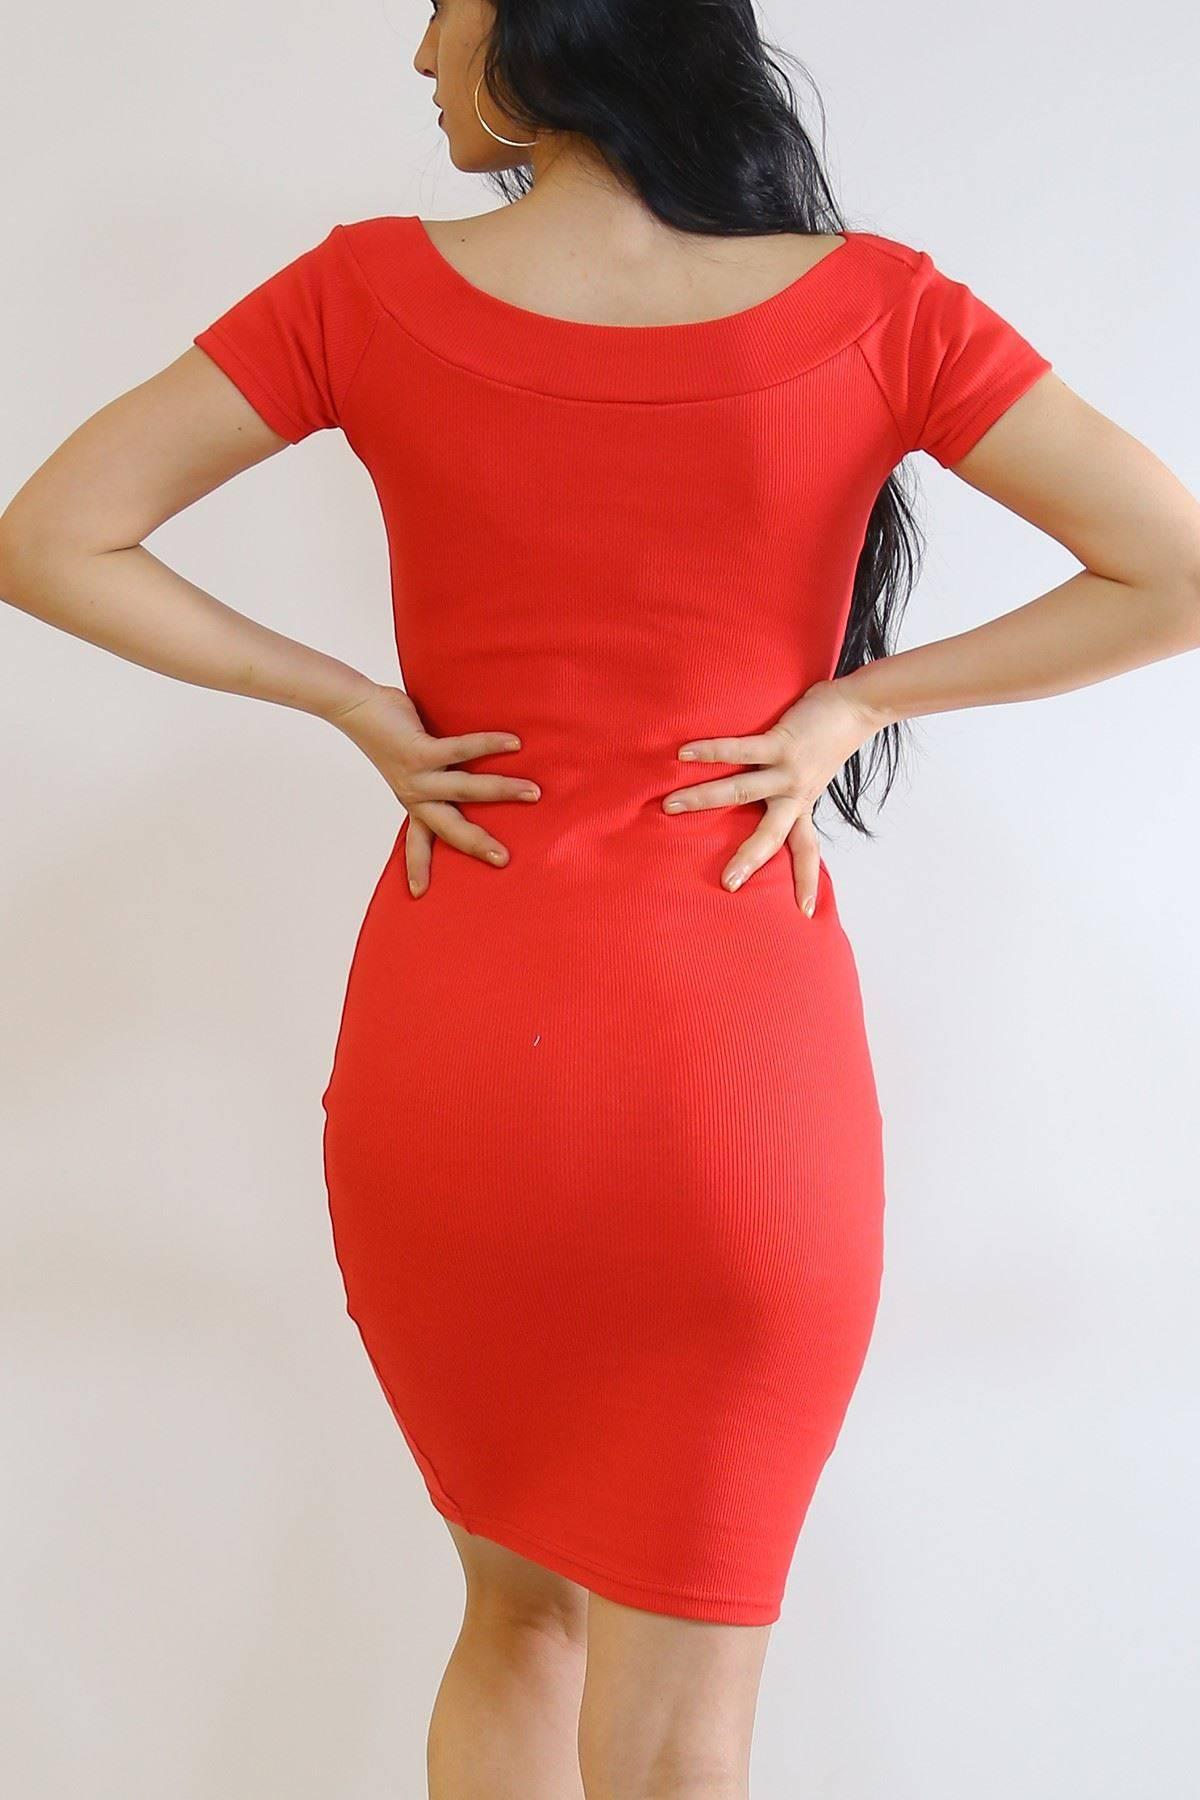 Madonna Elbise Kırmızı - 6401.316.